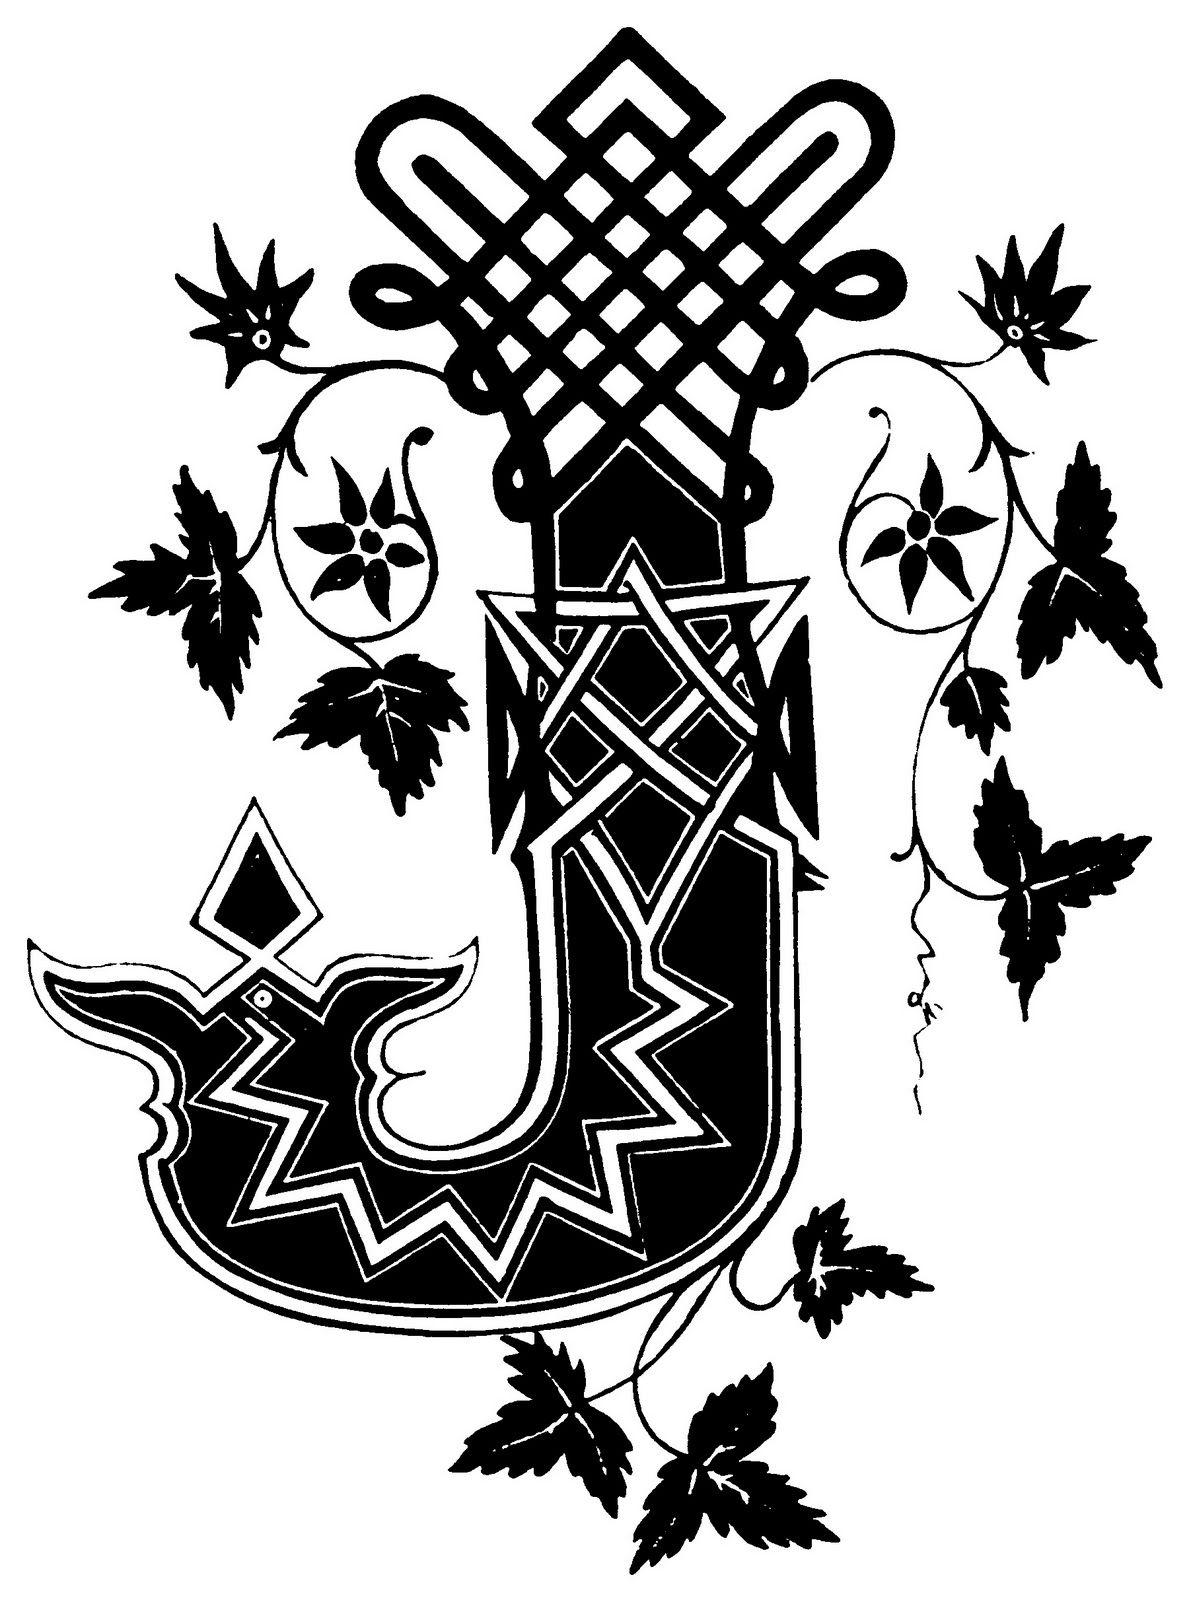 calligraphy letter J